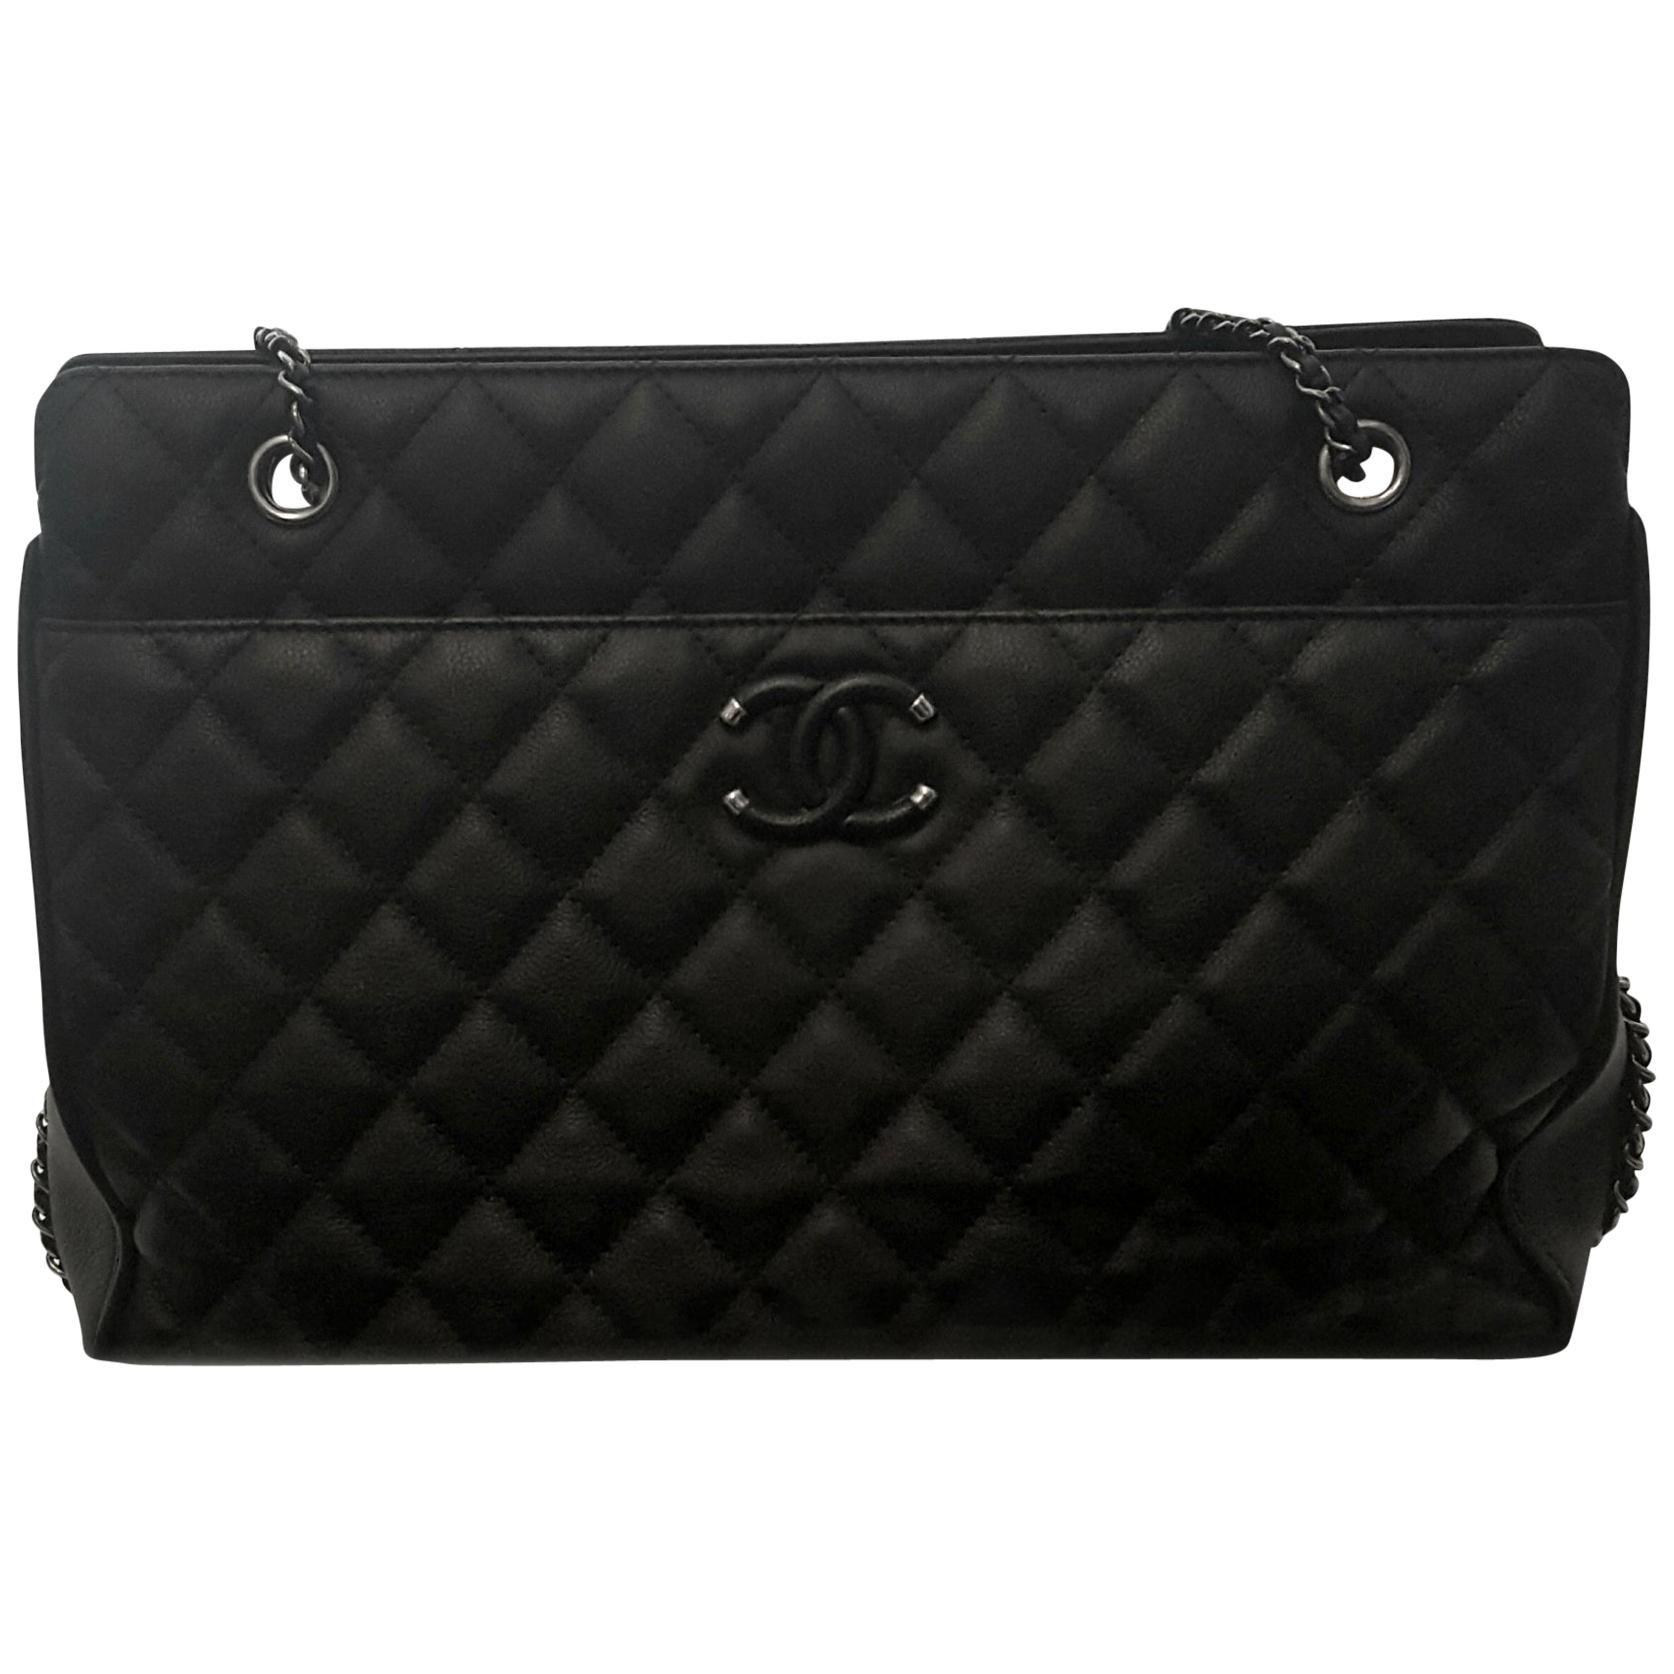 d4c740b98b3a Classic Collections - Fashion Handbags and Purses - 1stdibs